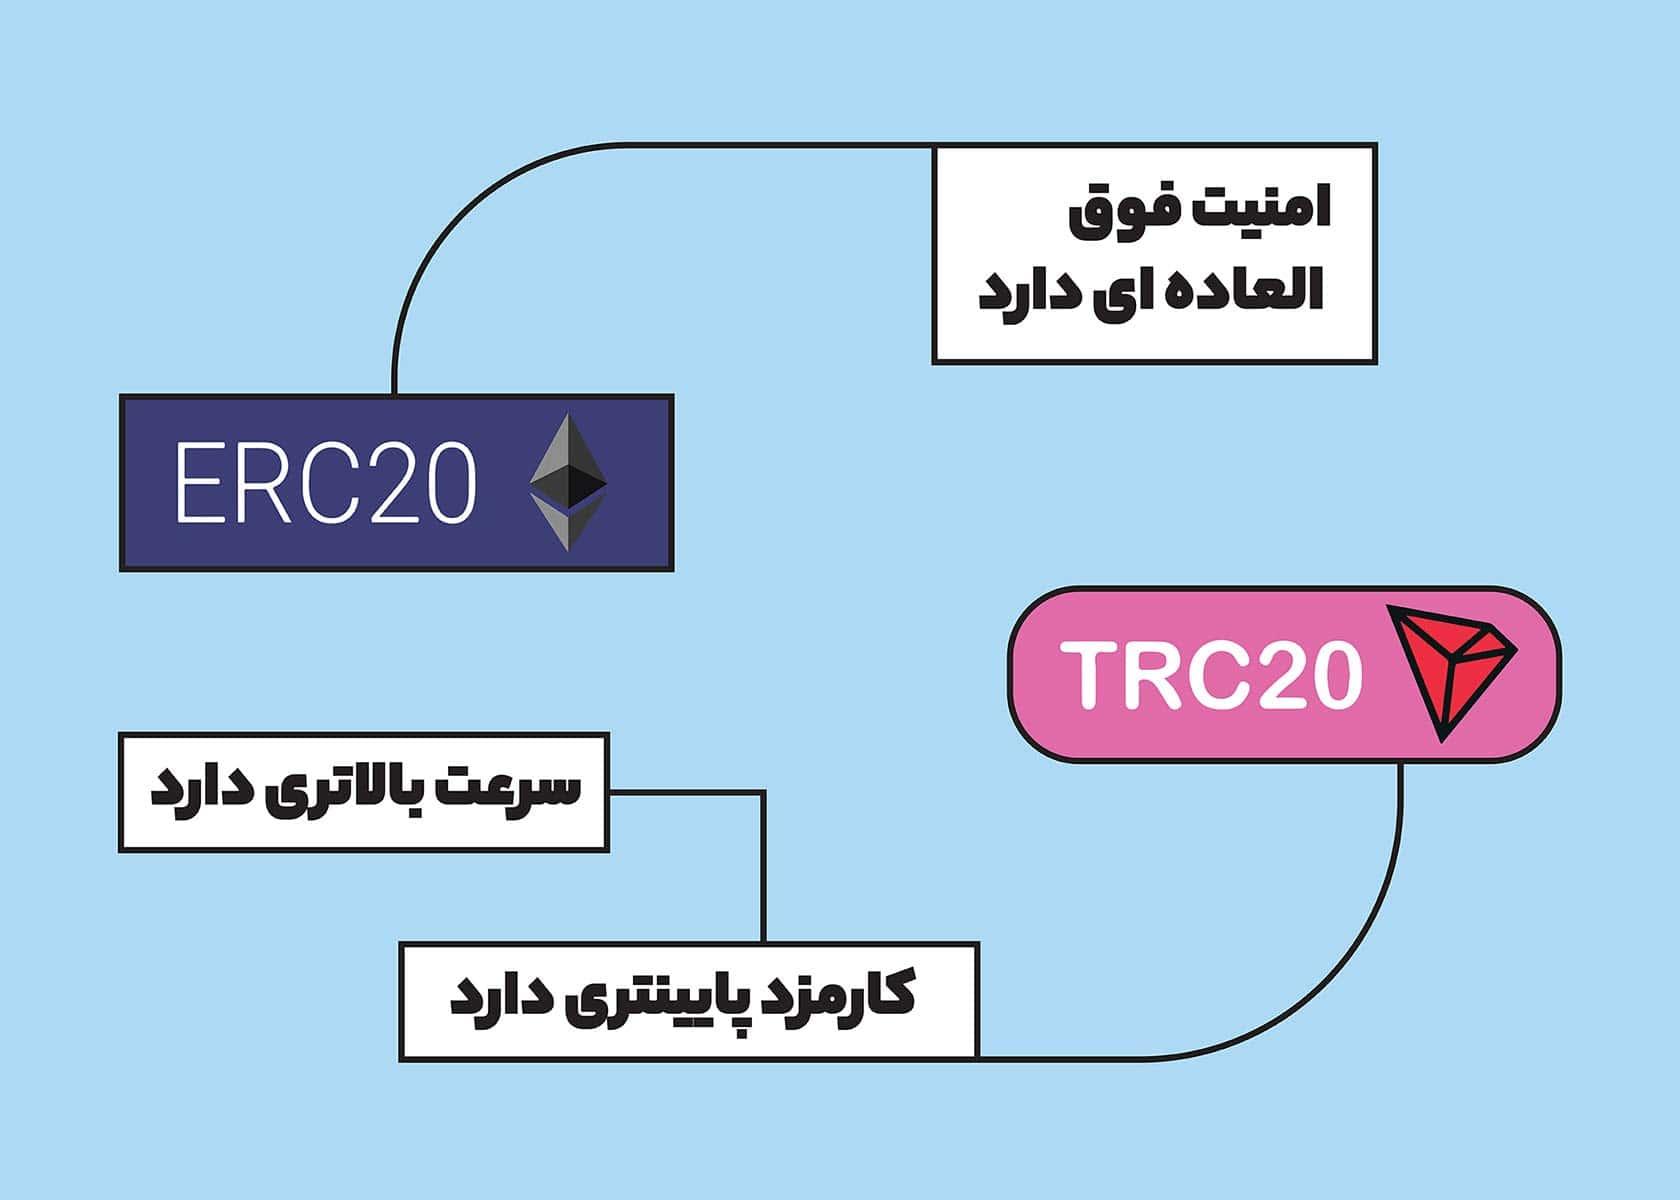 erc20 و tc20